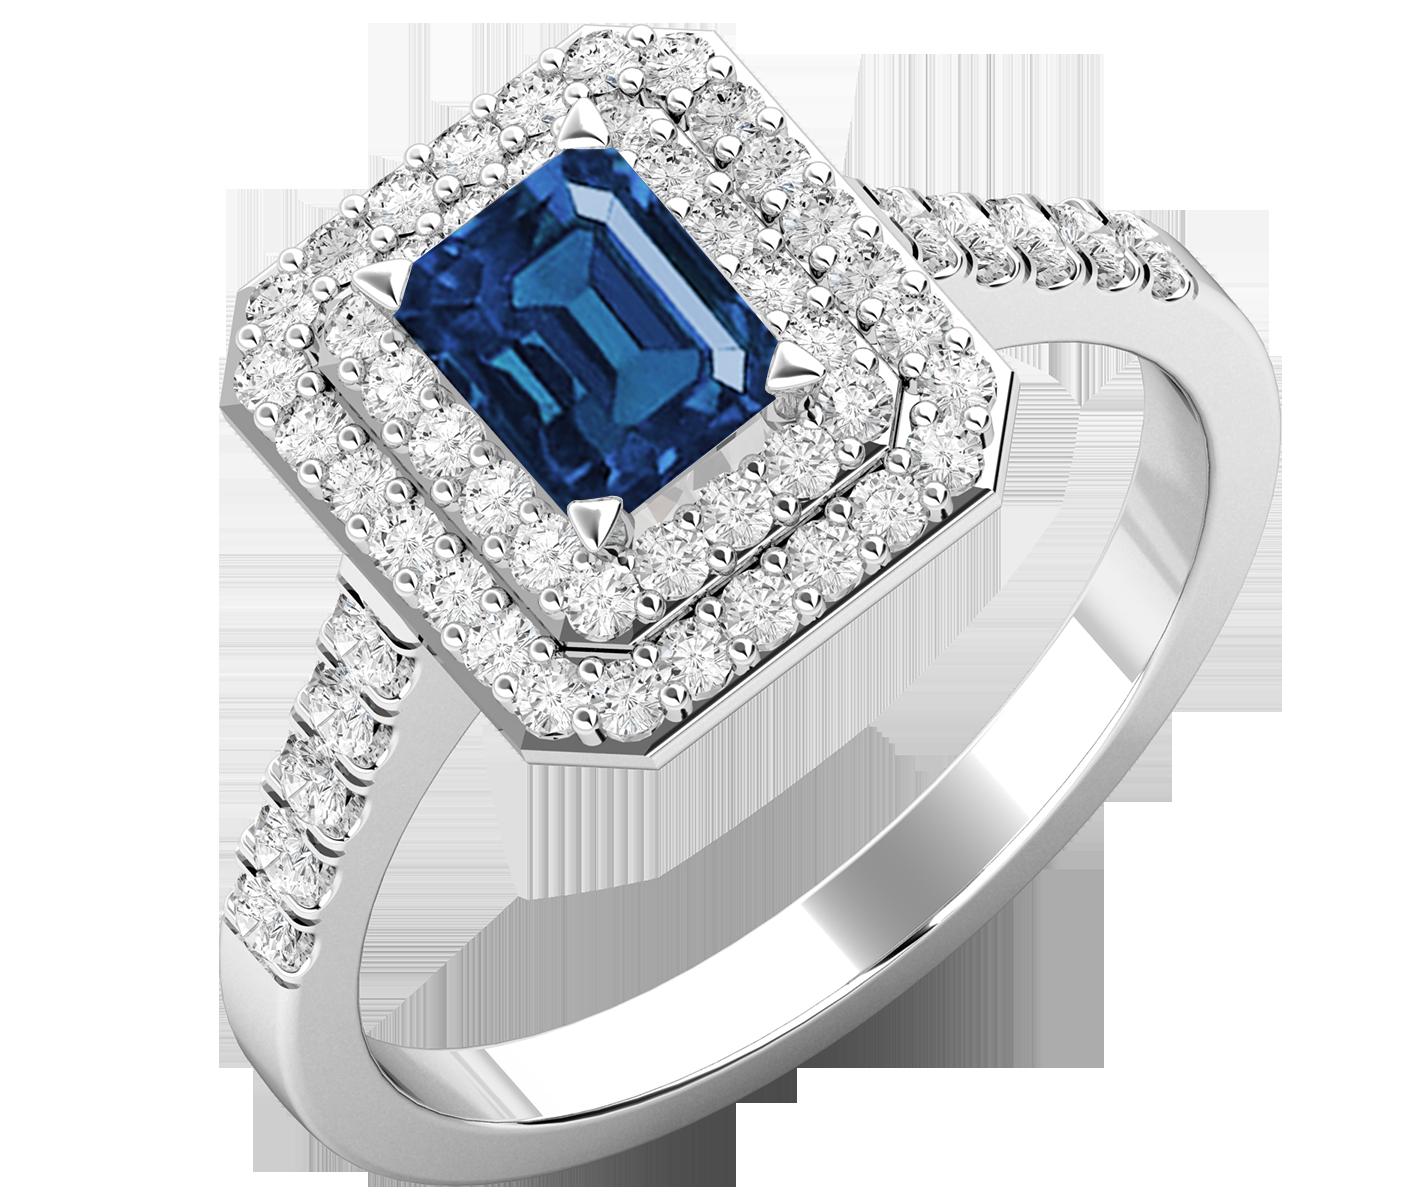 RDS614W-Inel cu Safir si Diamante Dama Aur Alb 18kt cu un Safir in Forma Smarald in Centru si Diamante Mici Rotund Briliant pe Margini-img1